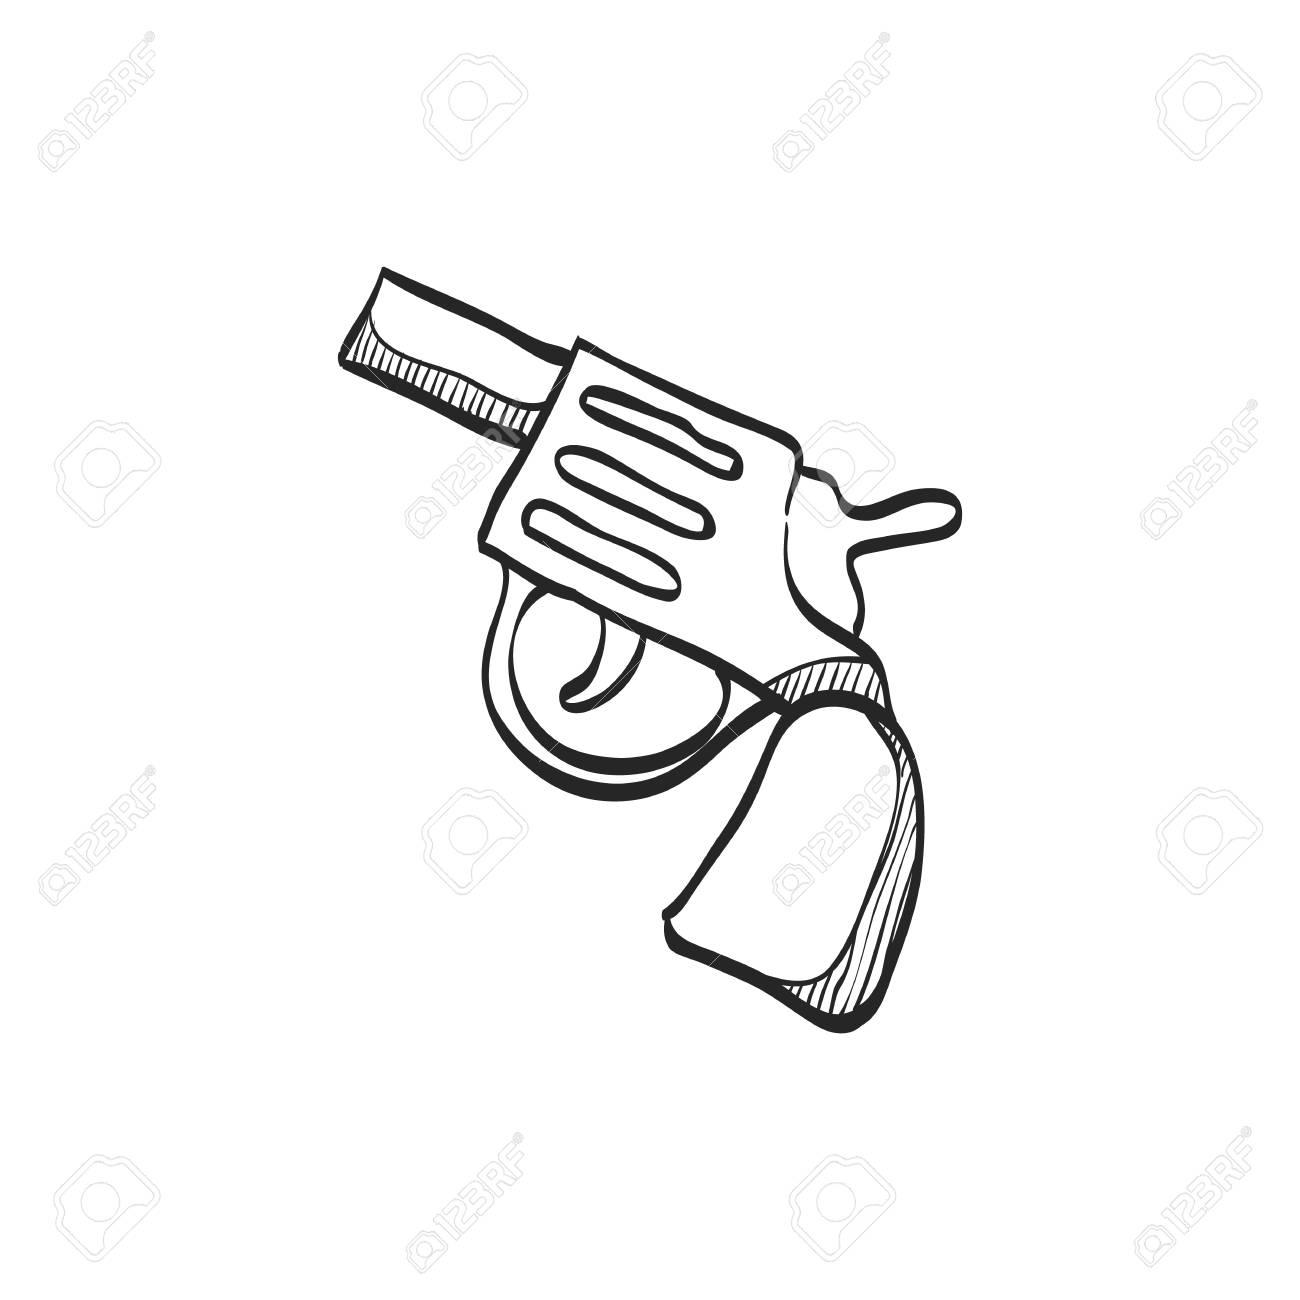 1300x1300 Revolver Gun Icon In Doodle Sketch Lines. Handgun Danger Police